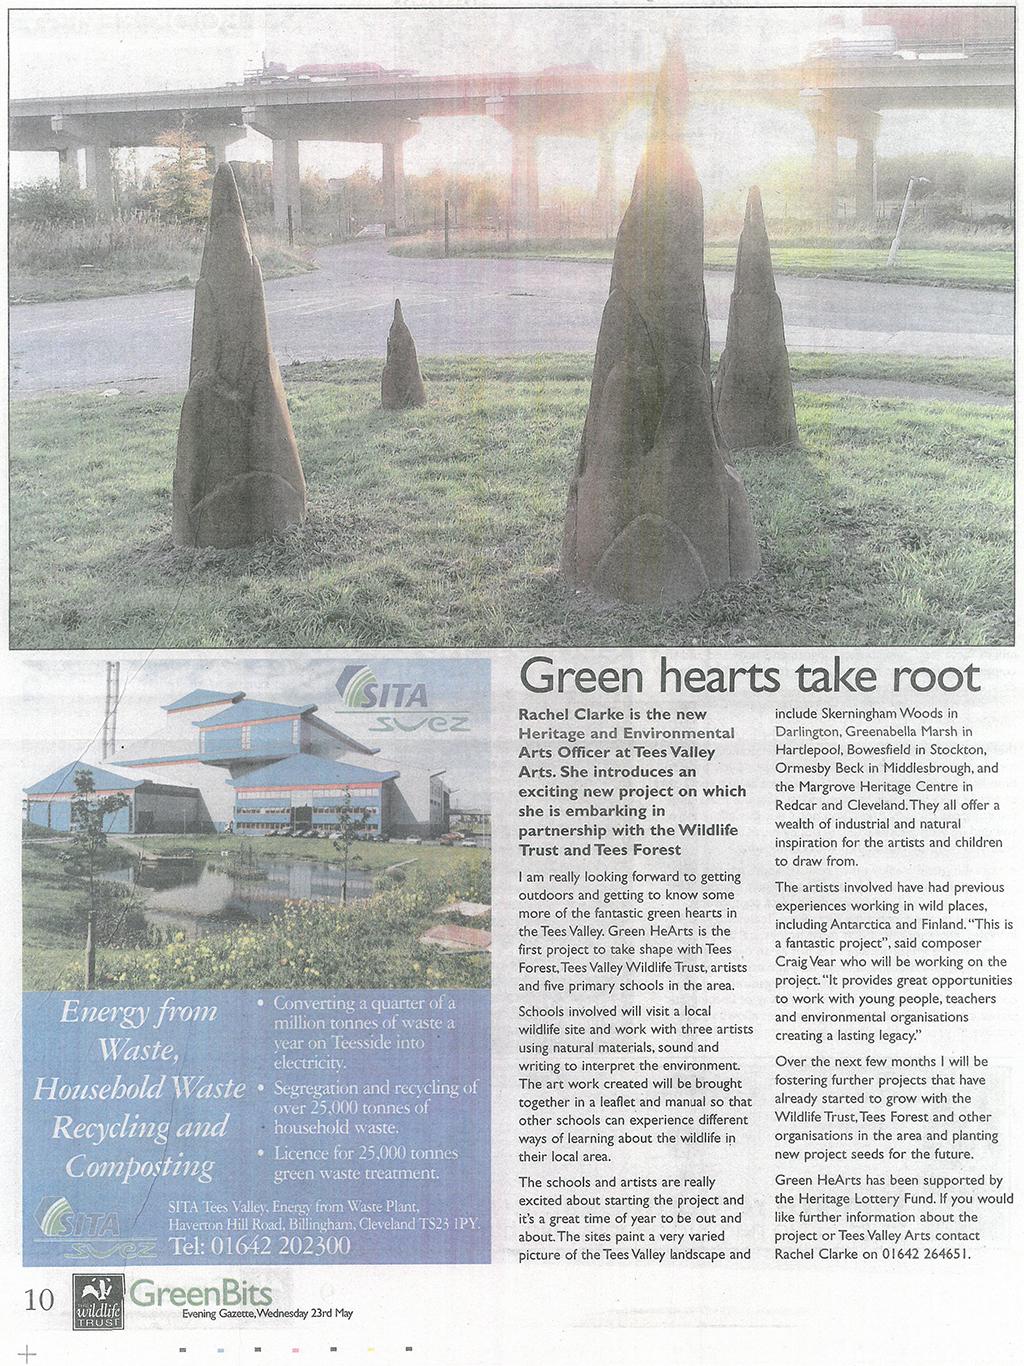 2007-05-23, evening gazette